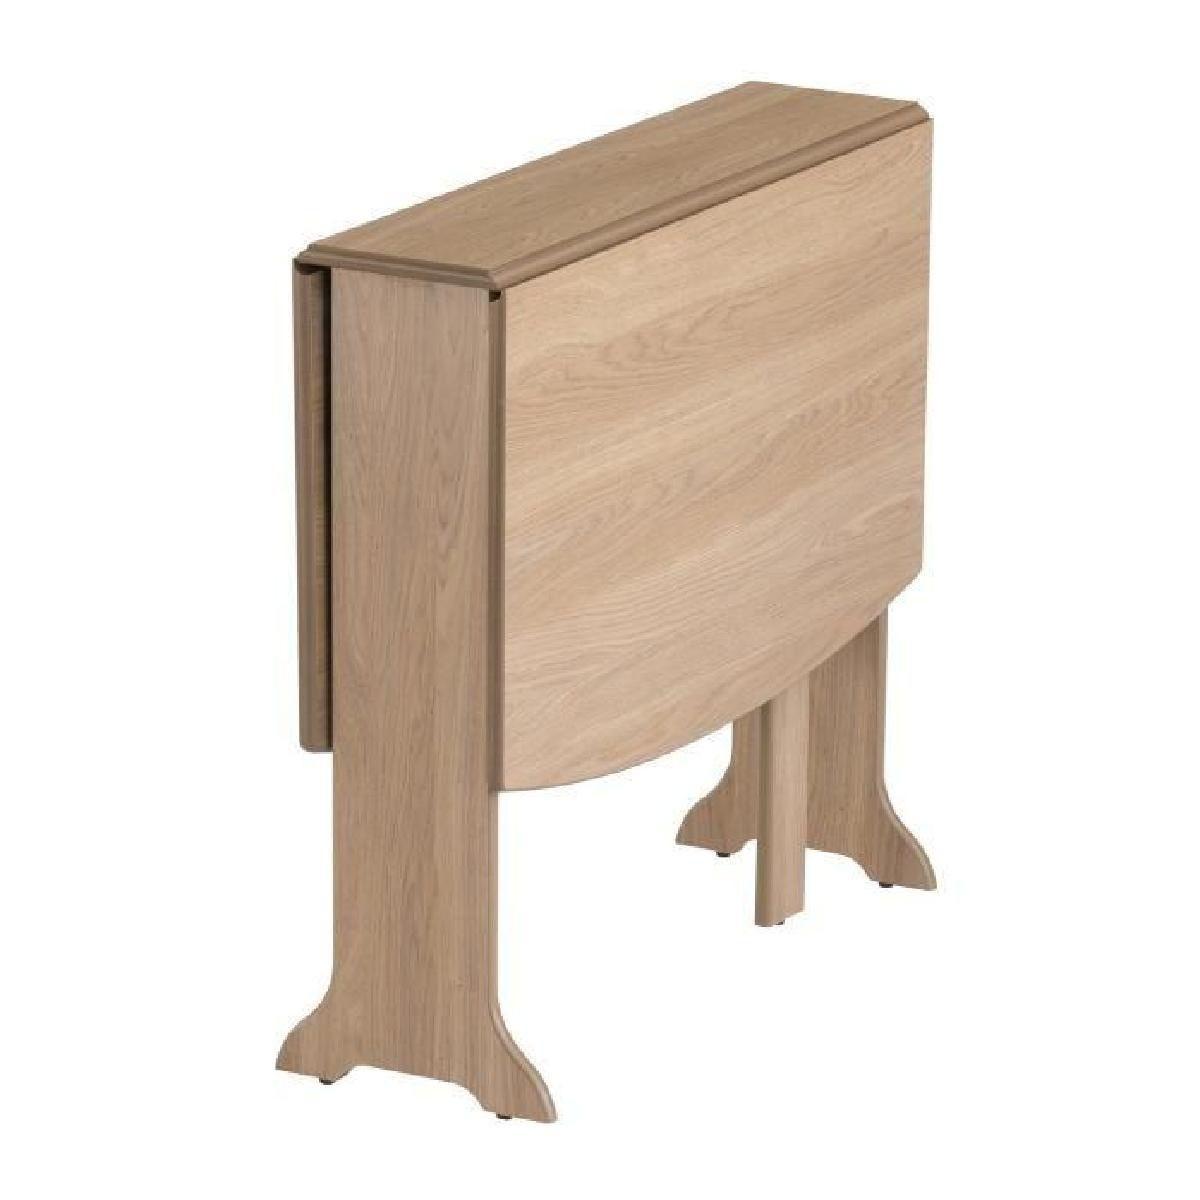 70 petite table pliante conforama 2020